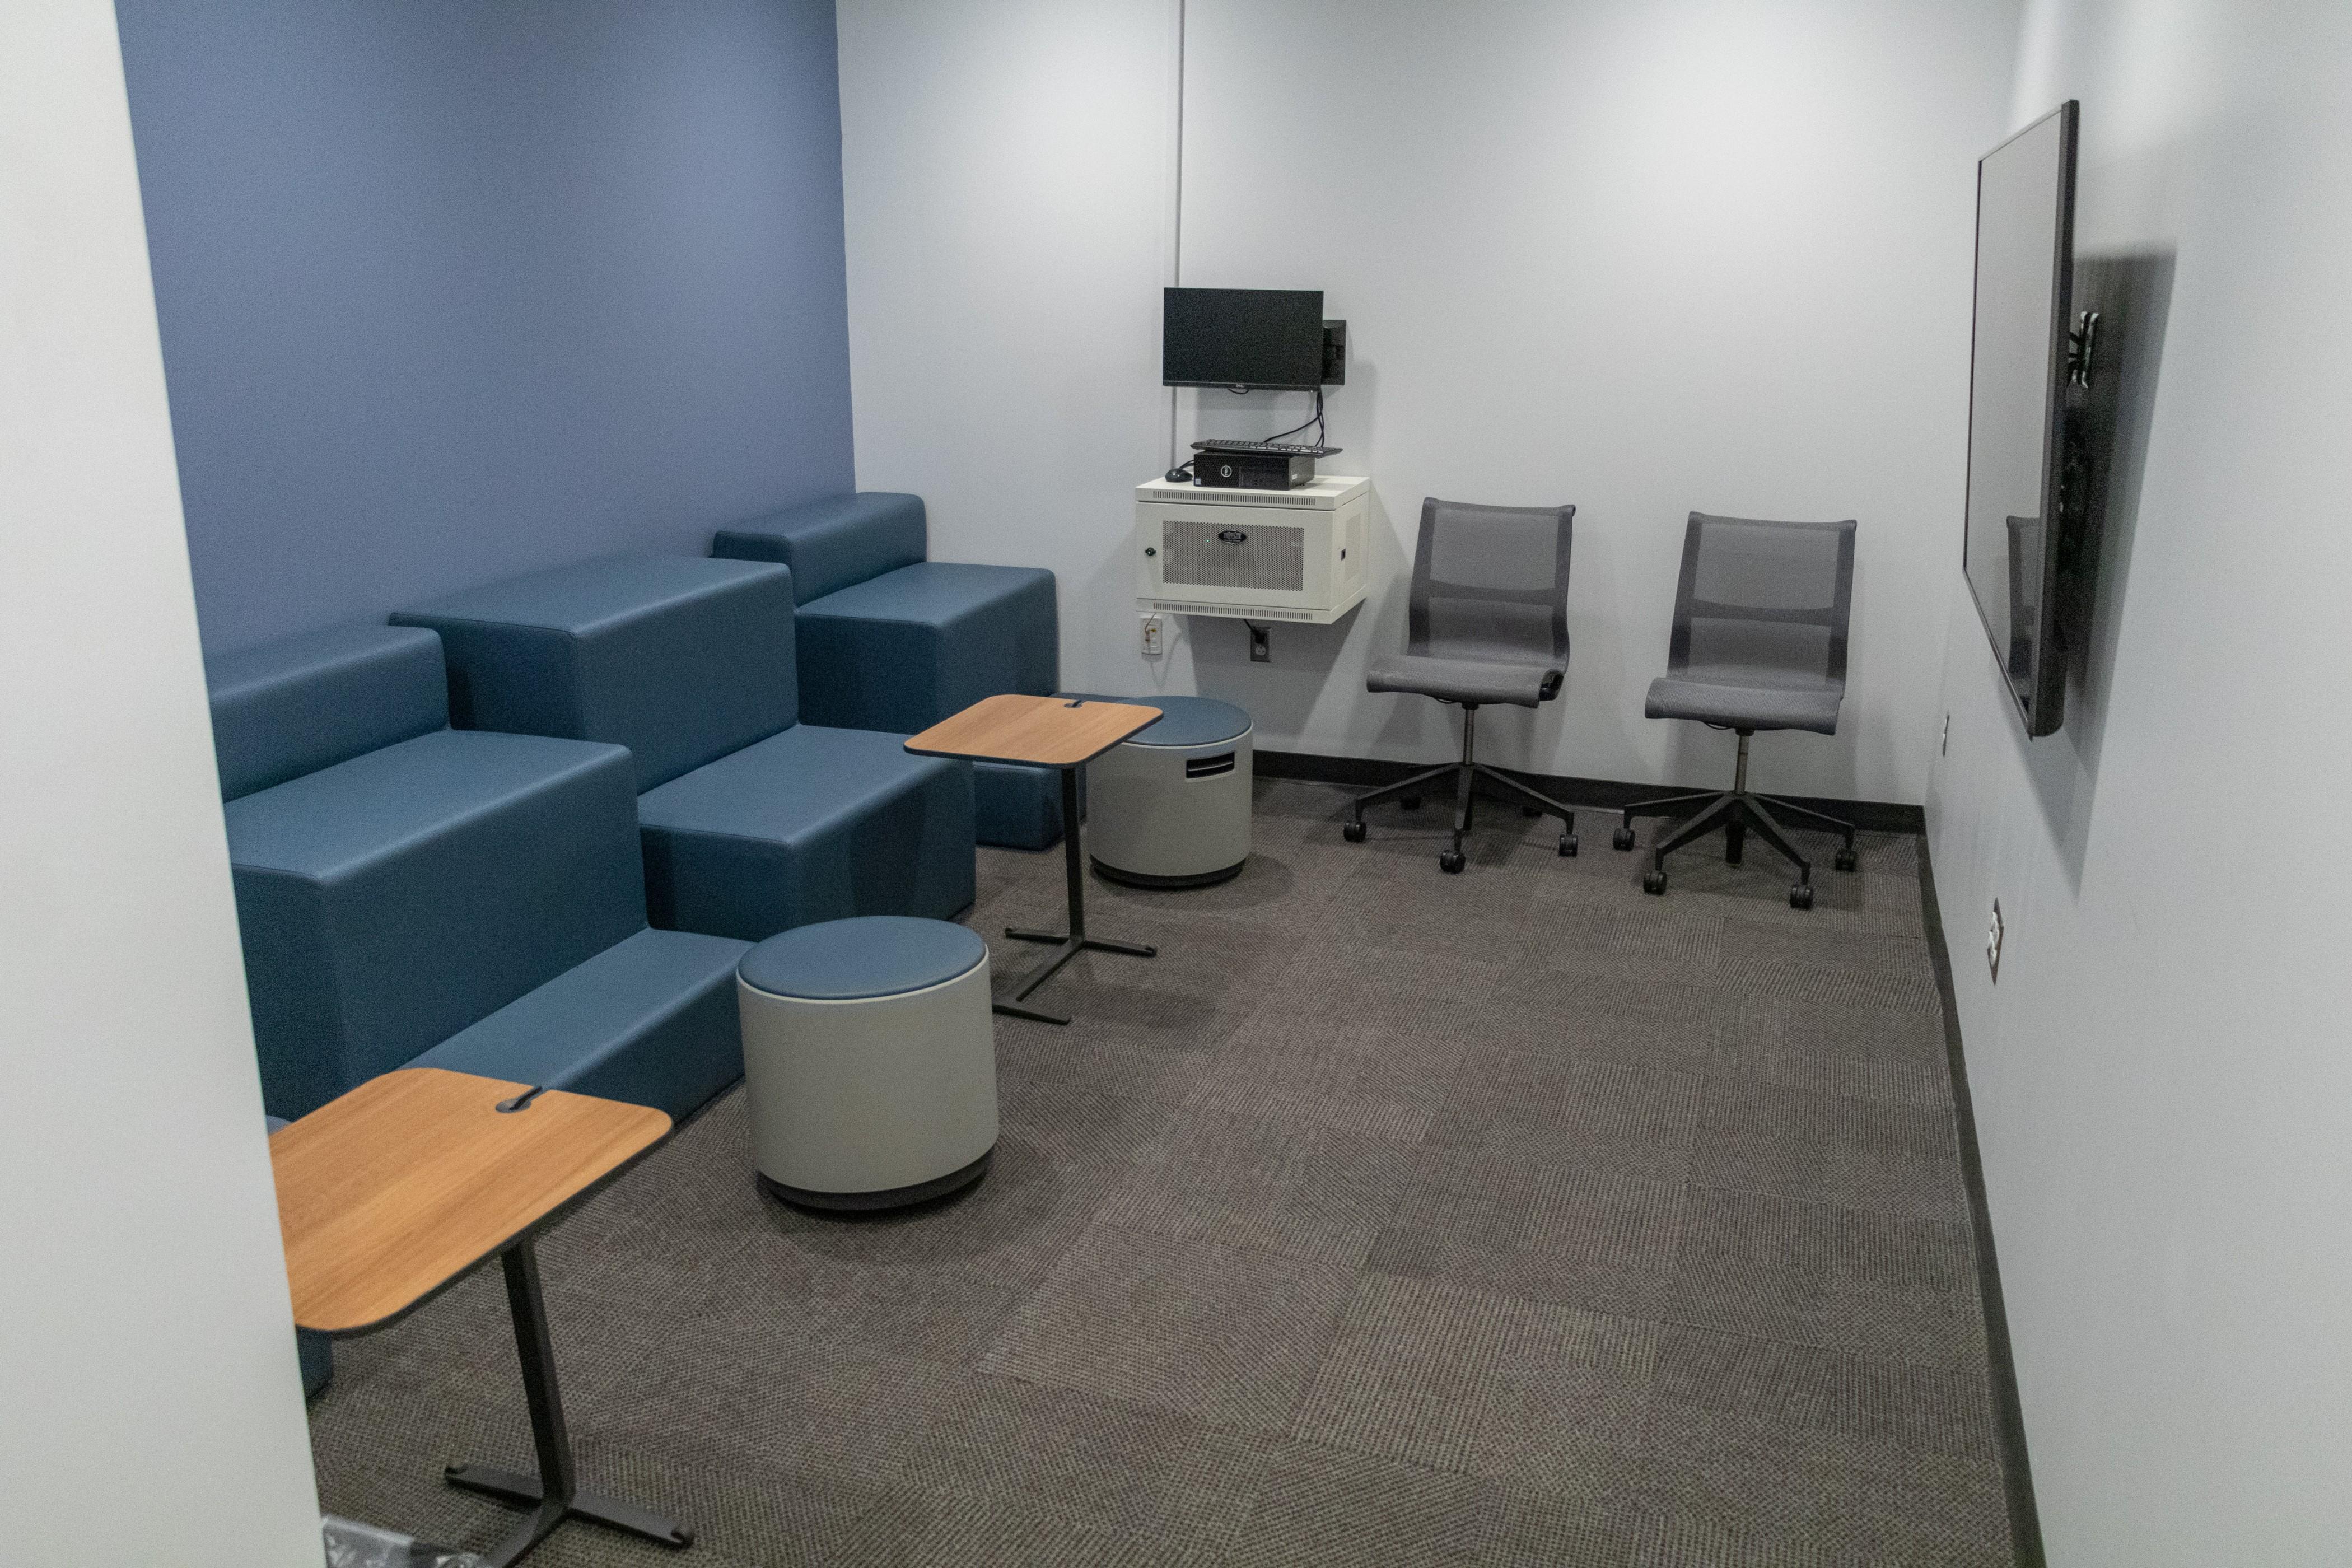 Room 118 - Presentation Room